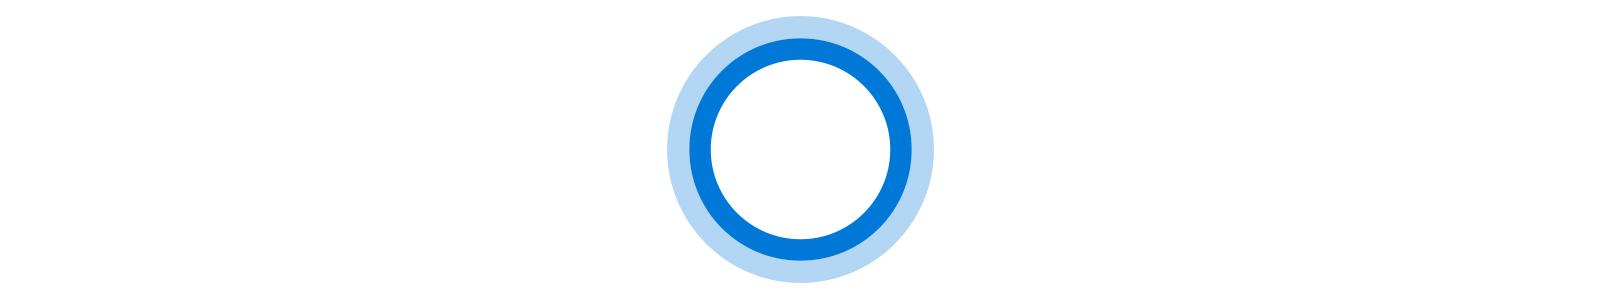 Cortana logo clipart clip art black and white download Cortana | Your Intelligent Virtual & Personal Assistant | Microsoft clip art black and white download